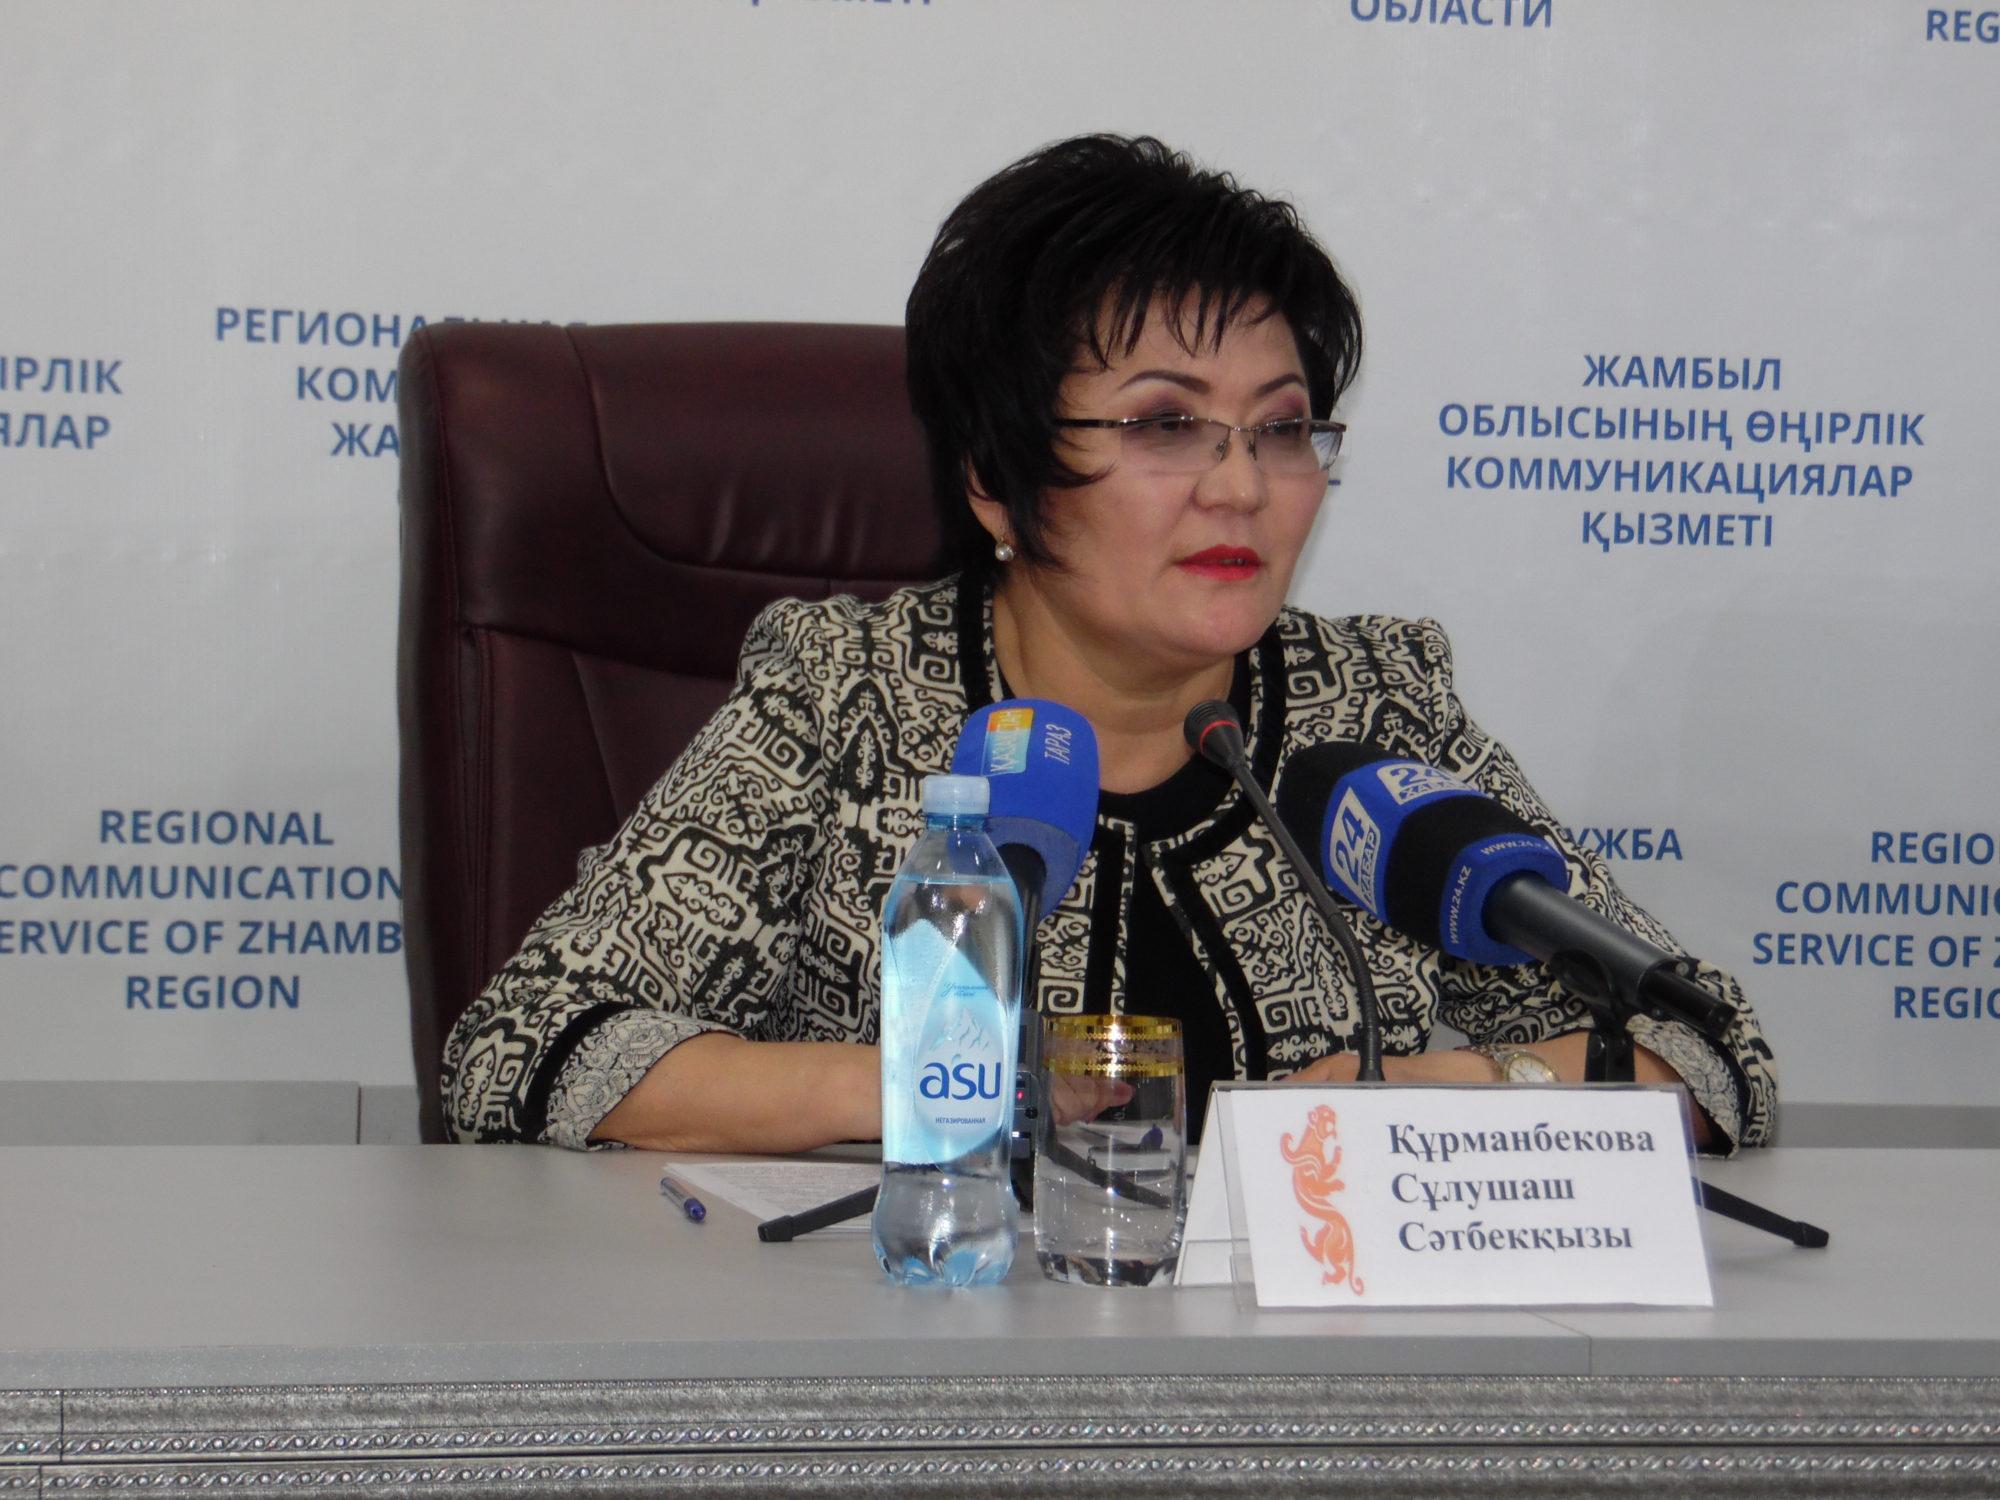 Сулушаш Сатбековна